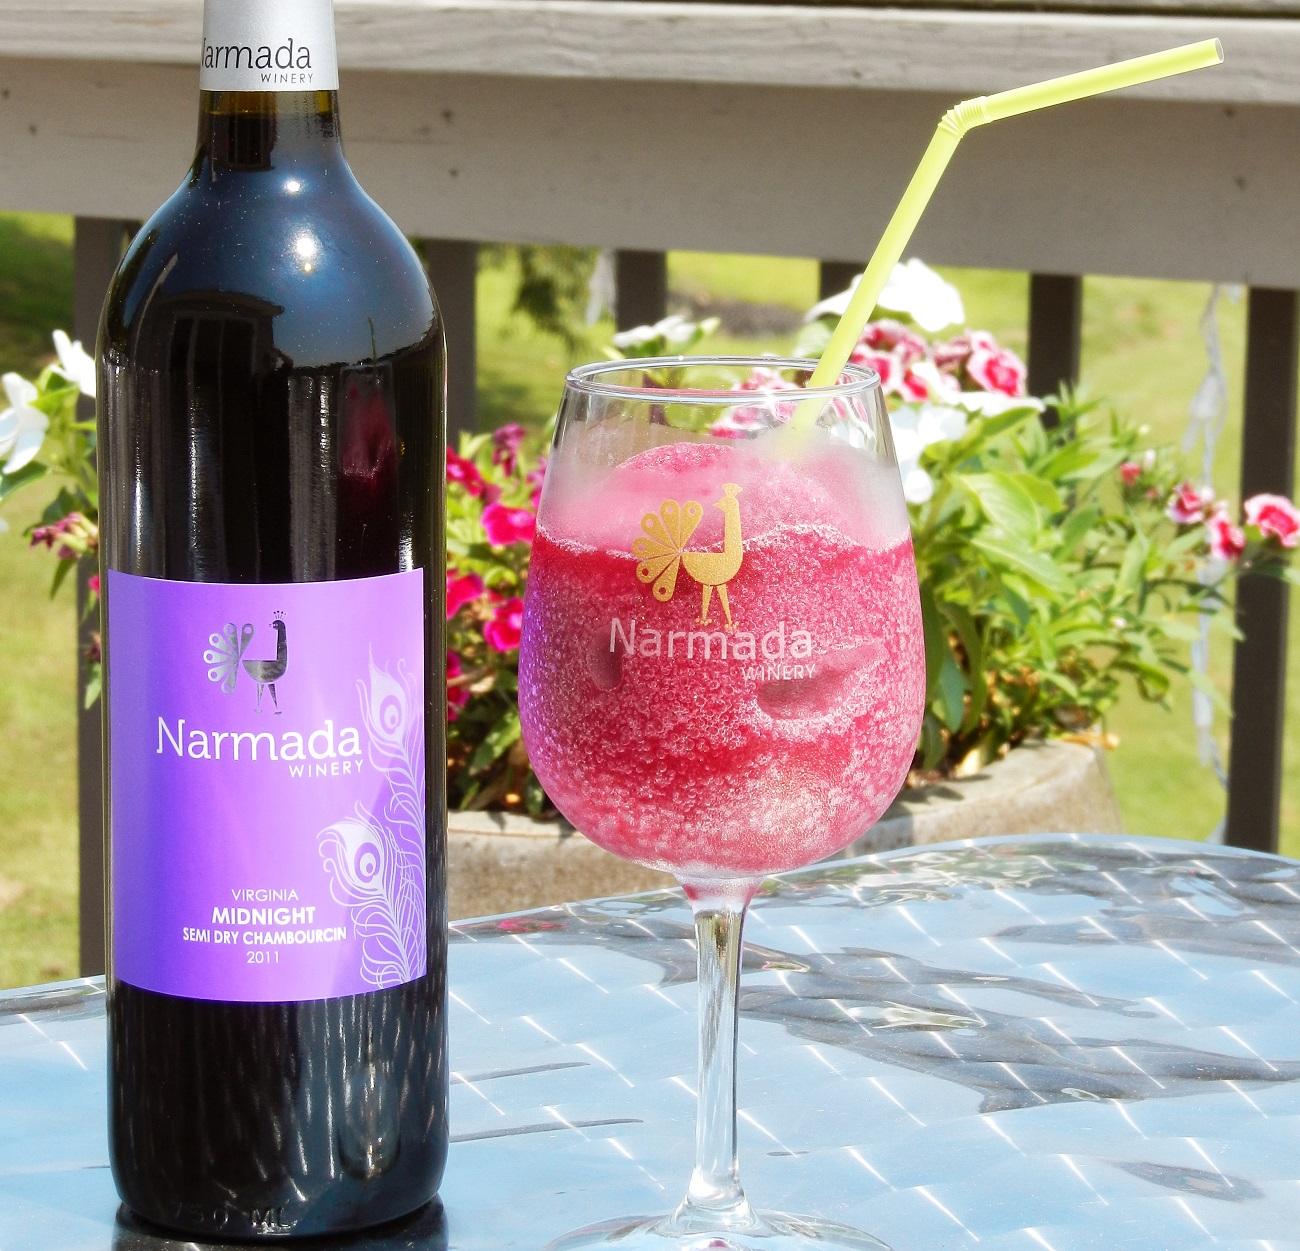 frozen wine slushies at narmada winery and vineyard